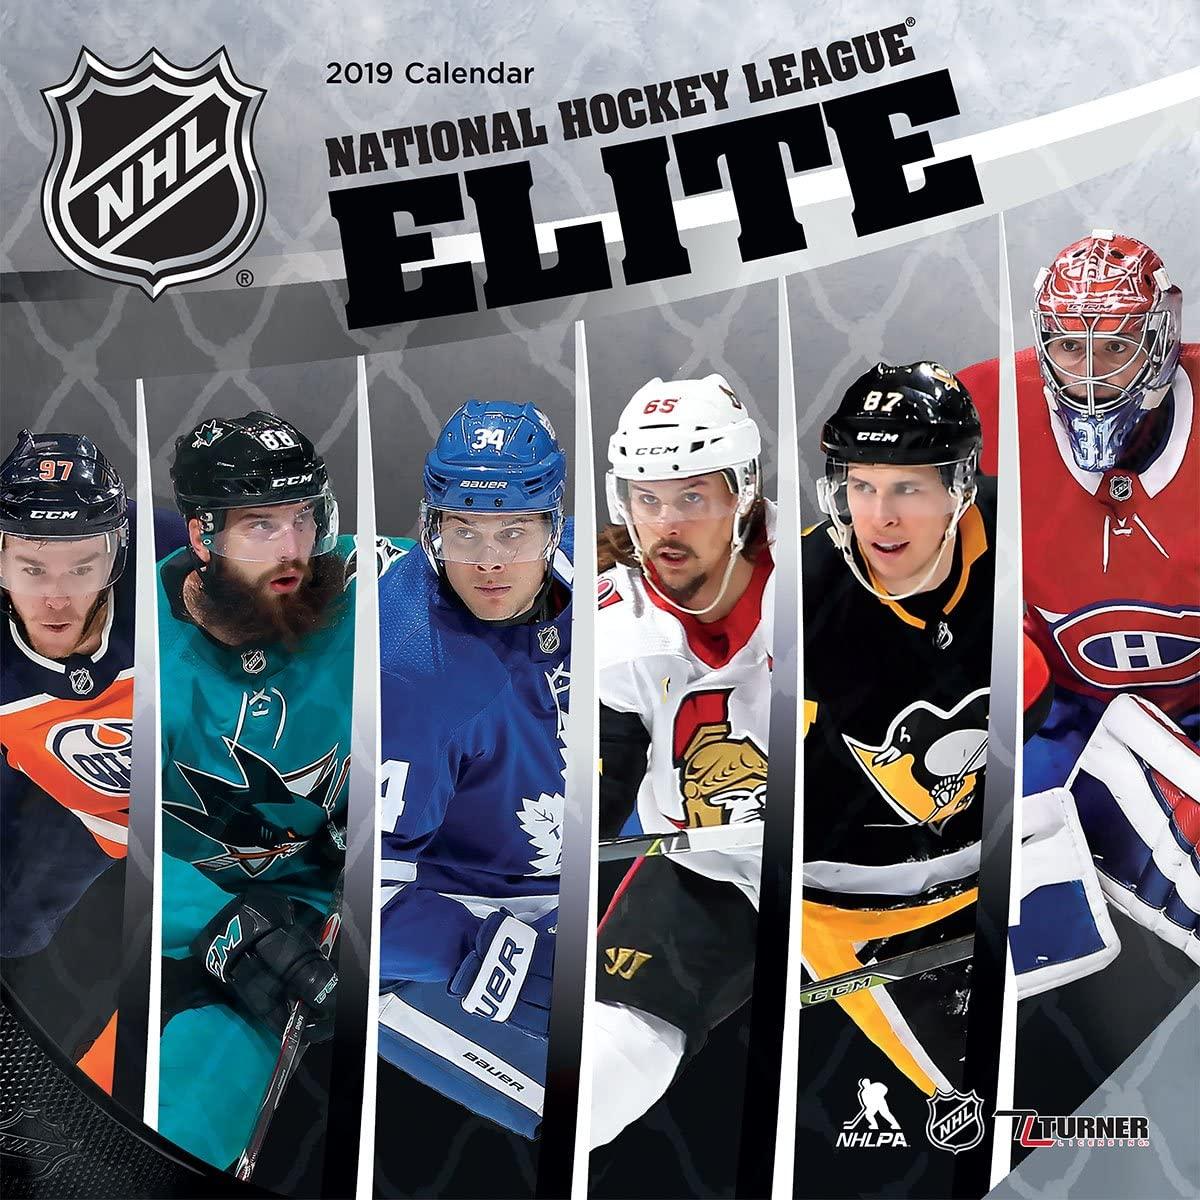 Turner Sport NHL Elite 2019 12X12 Wall Calendar (19998011972)